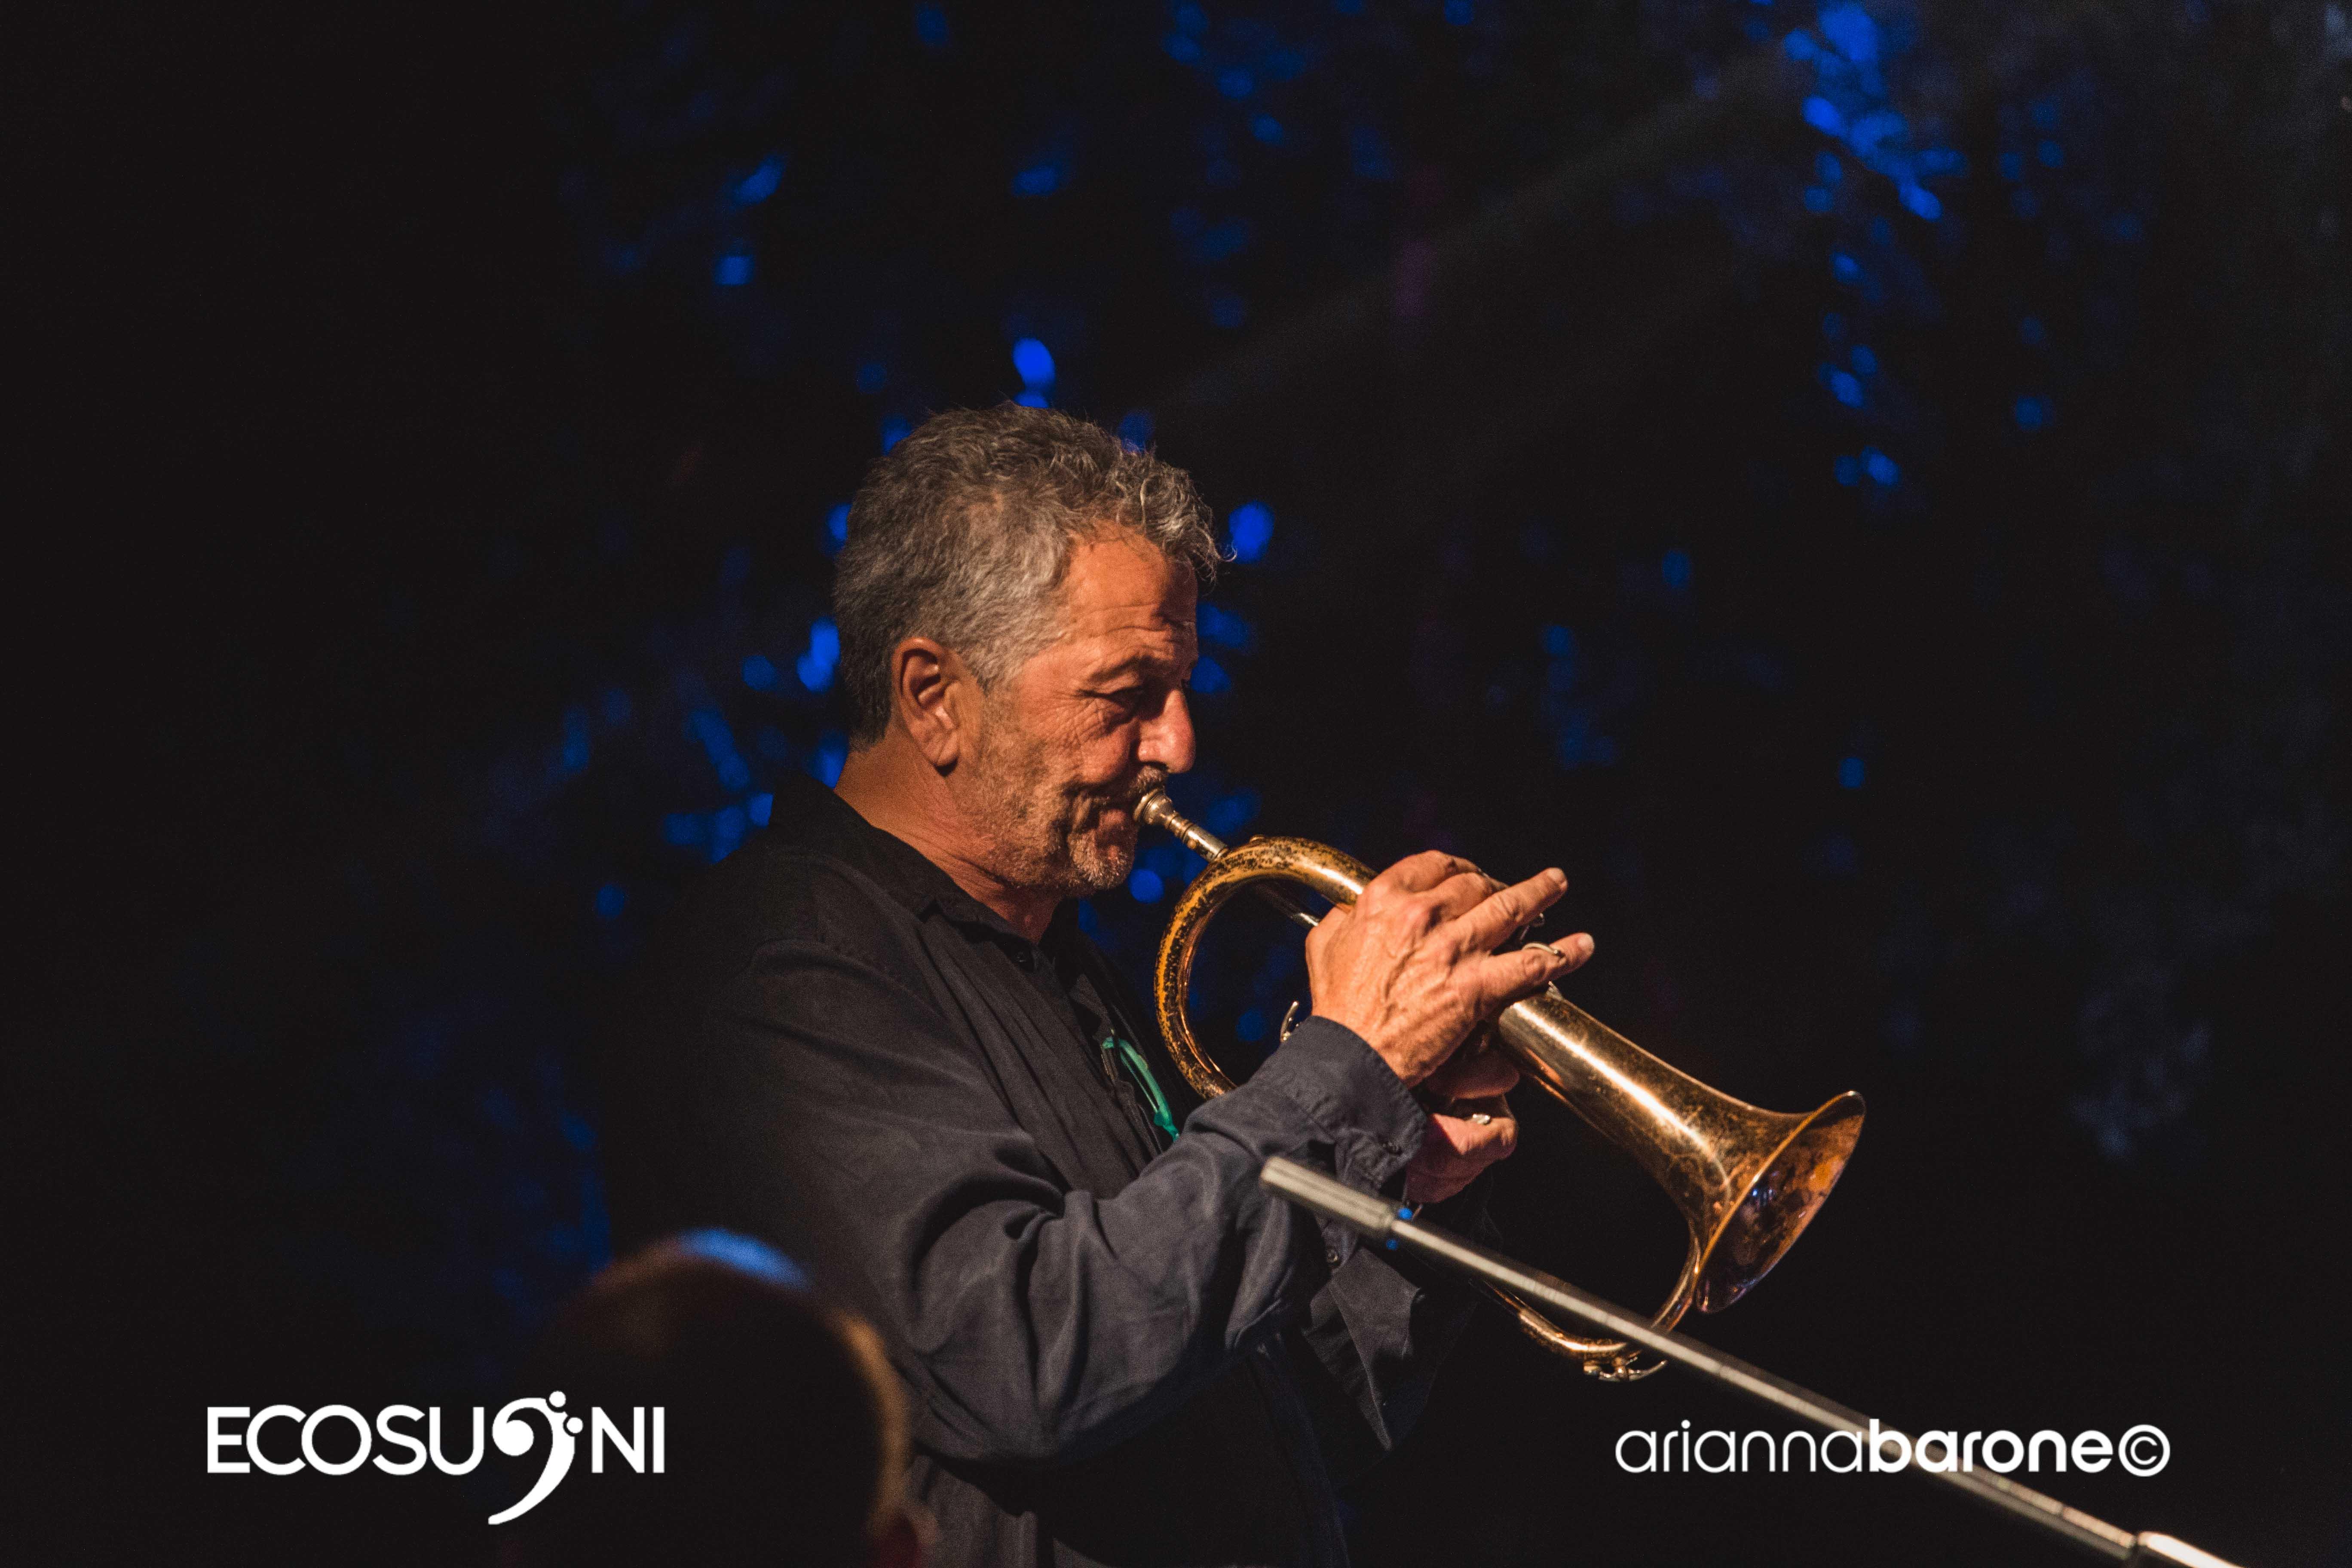 Ecosuoni - Terracina 2019 - 8